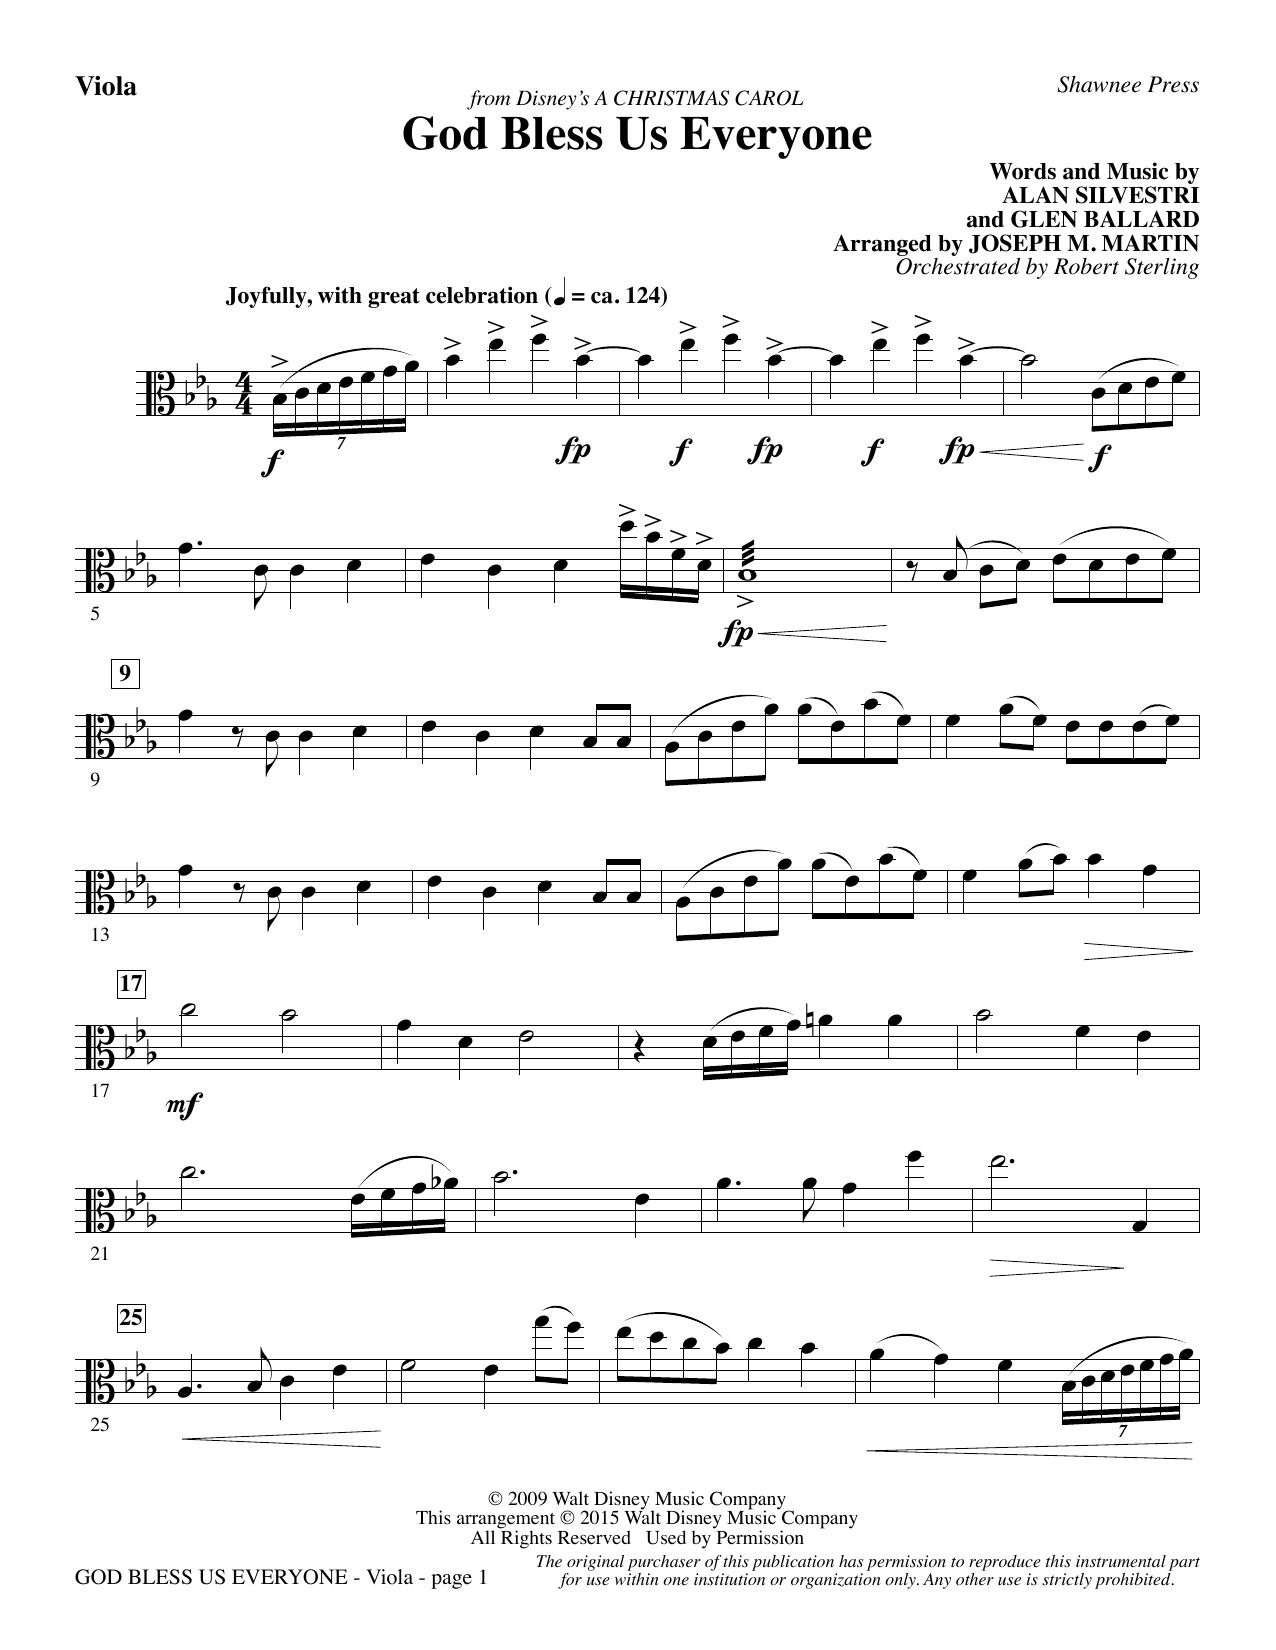 God Bless Us Everyone (from Disney's A Christmas Carol) - Viola sheet music